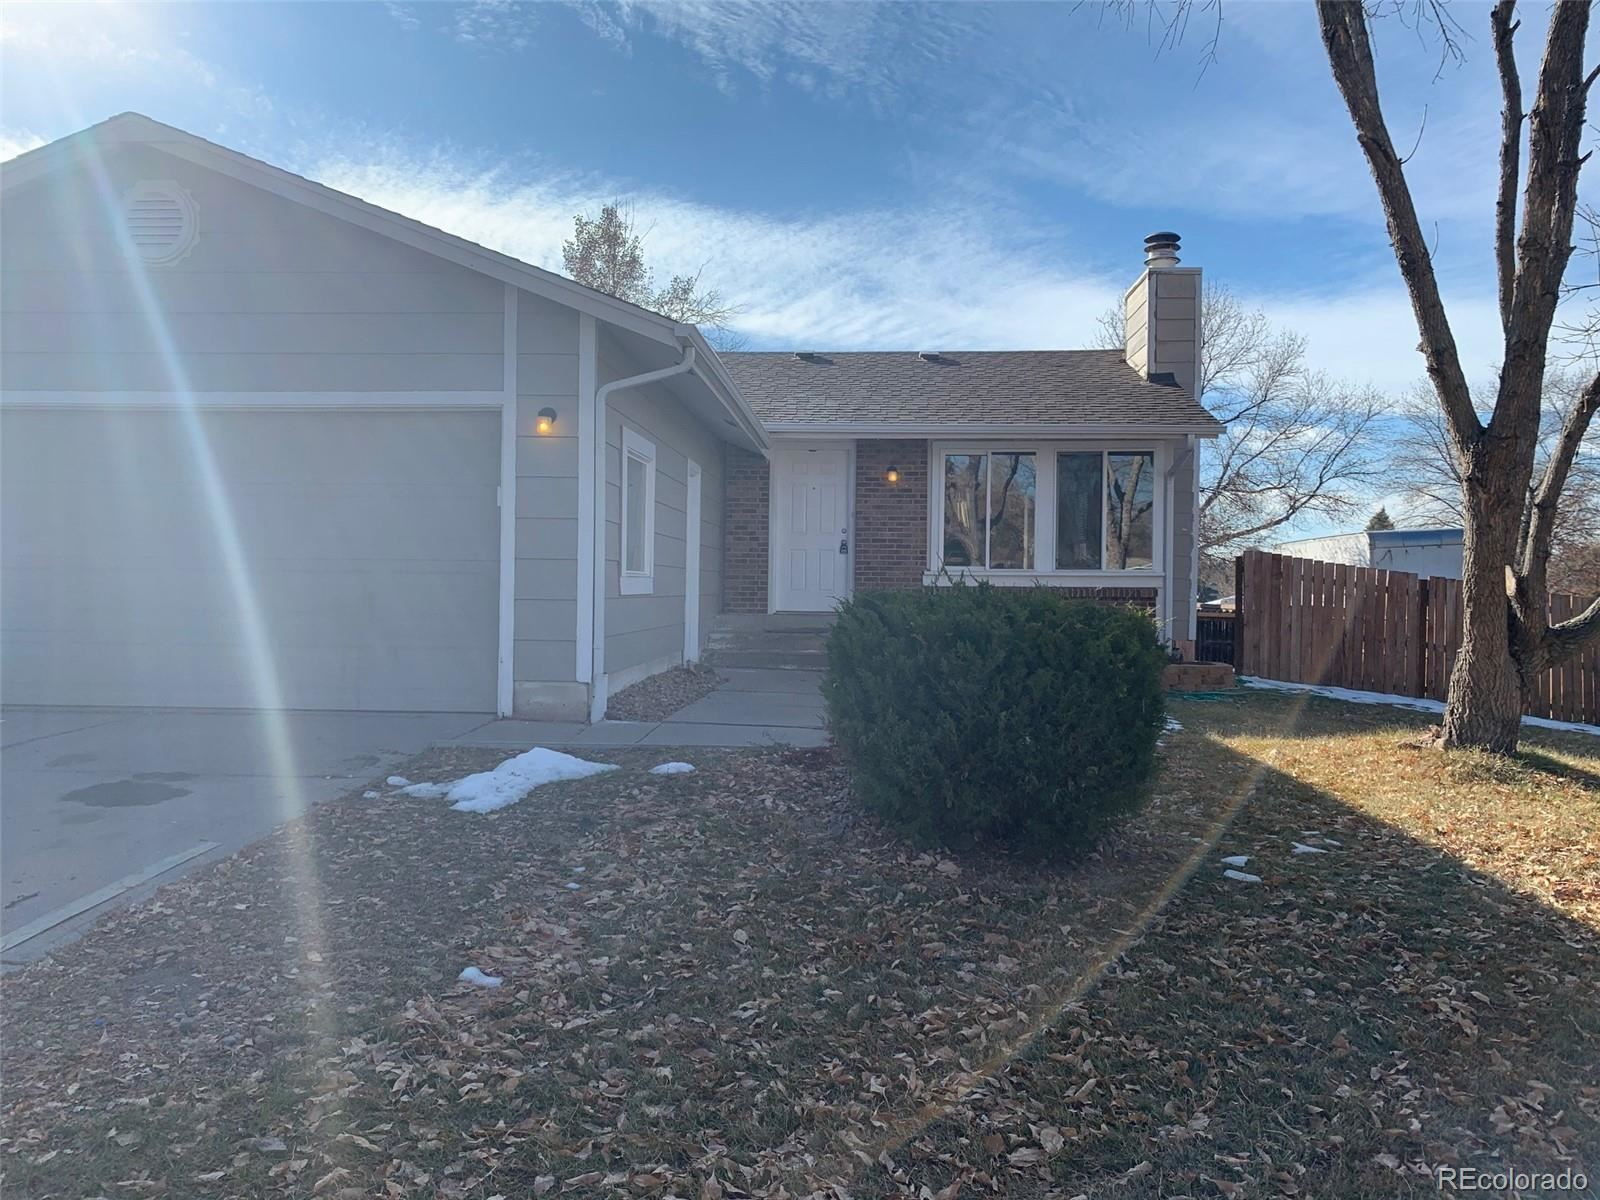 3855 S Nucla Street, Aurora, CO 80013 - MLS#: 1716858